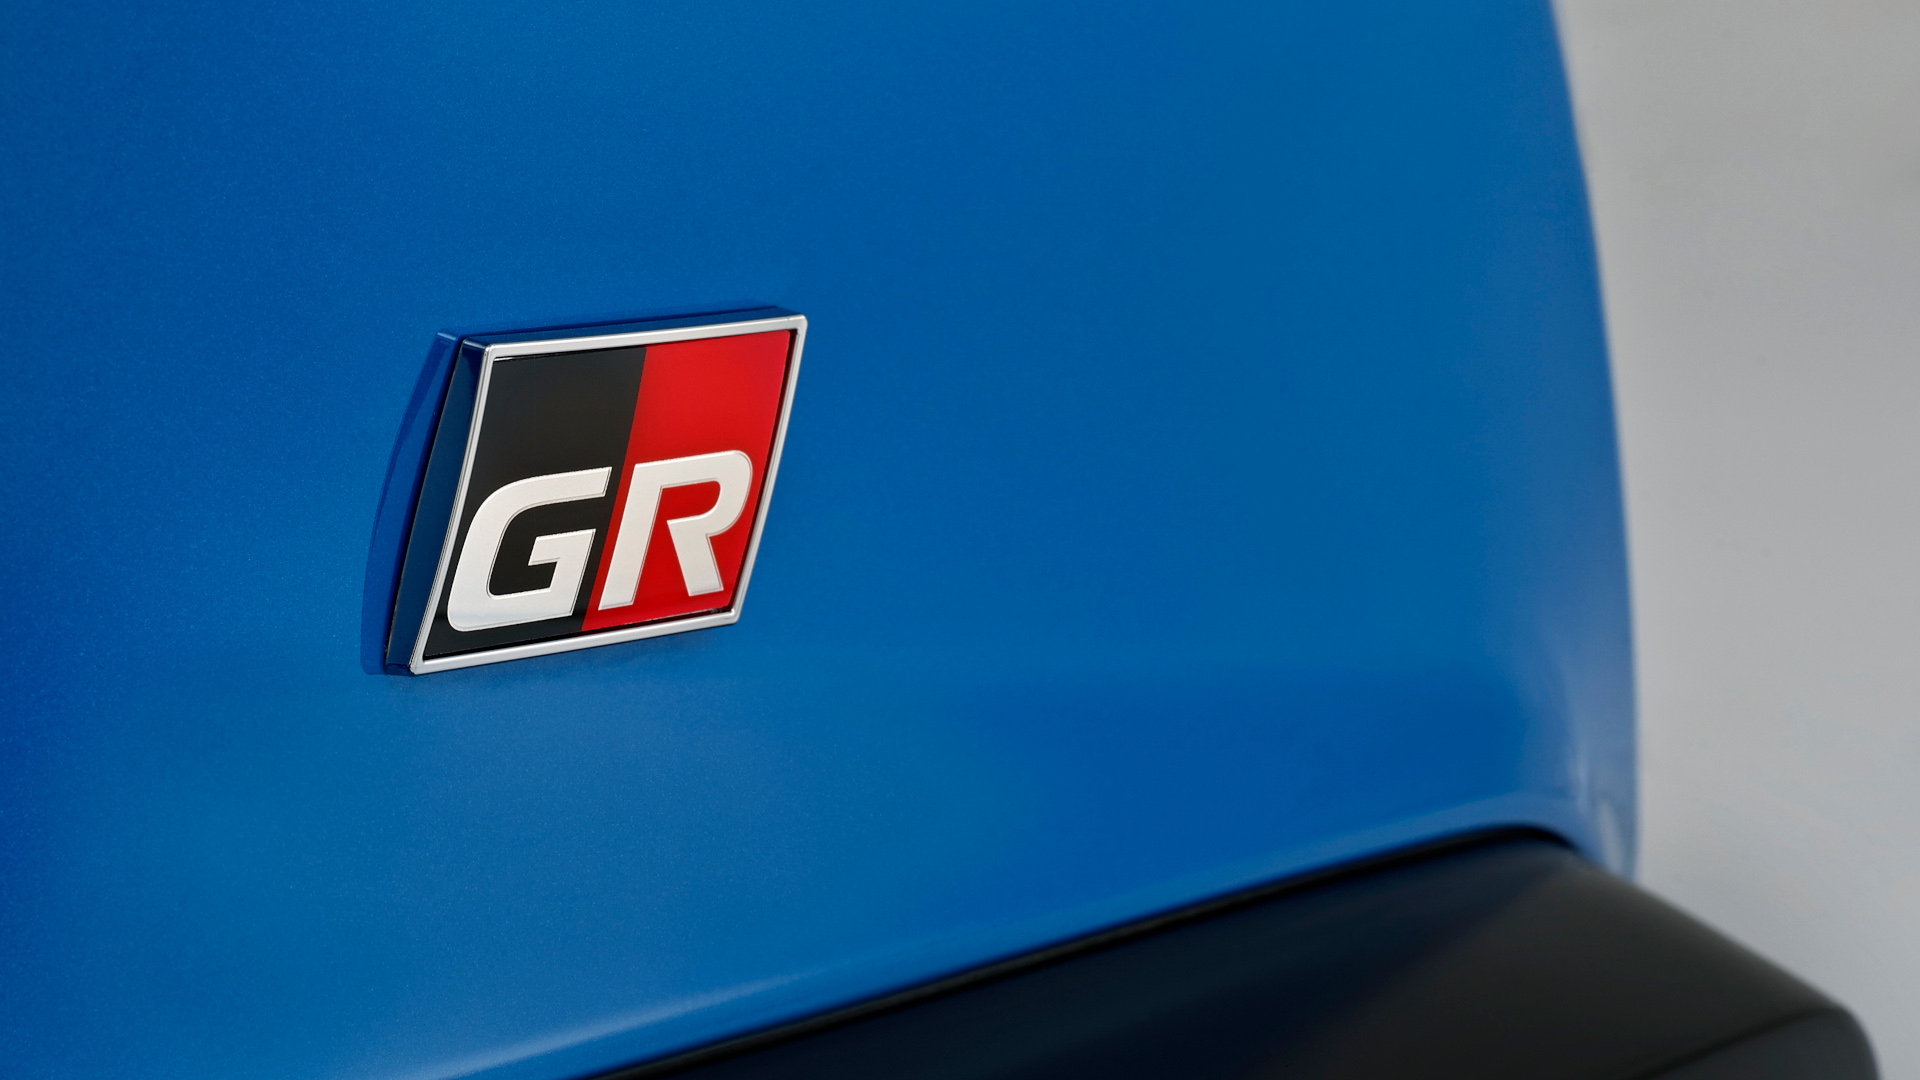 The Toyota GR Emblem